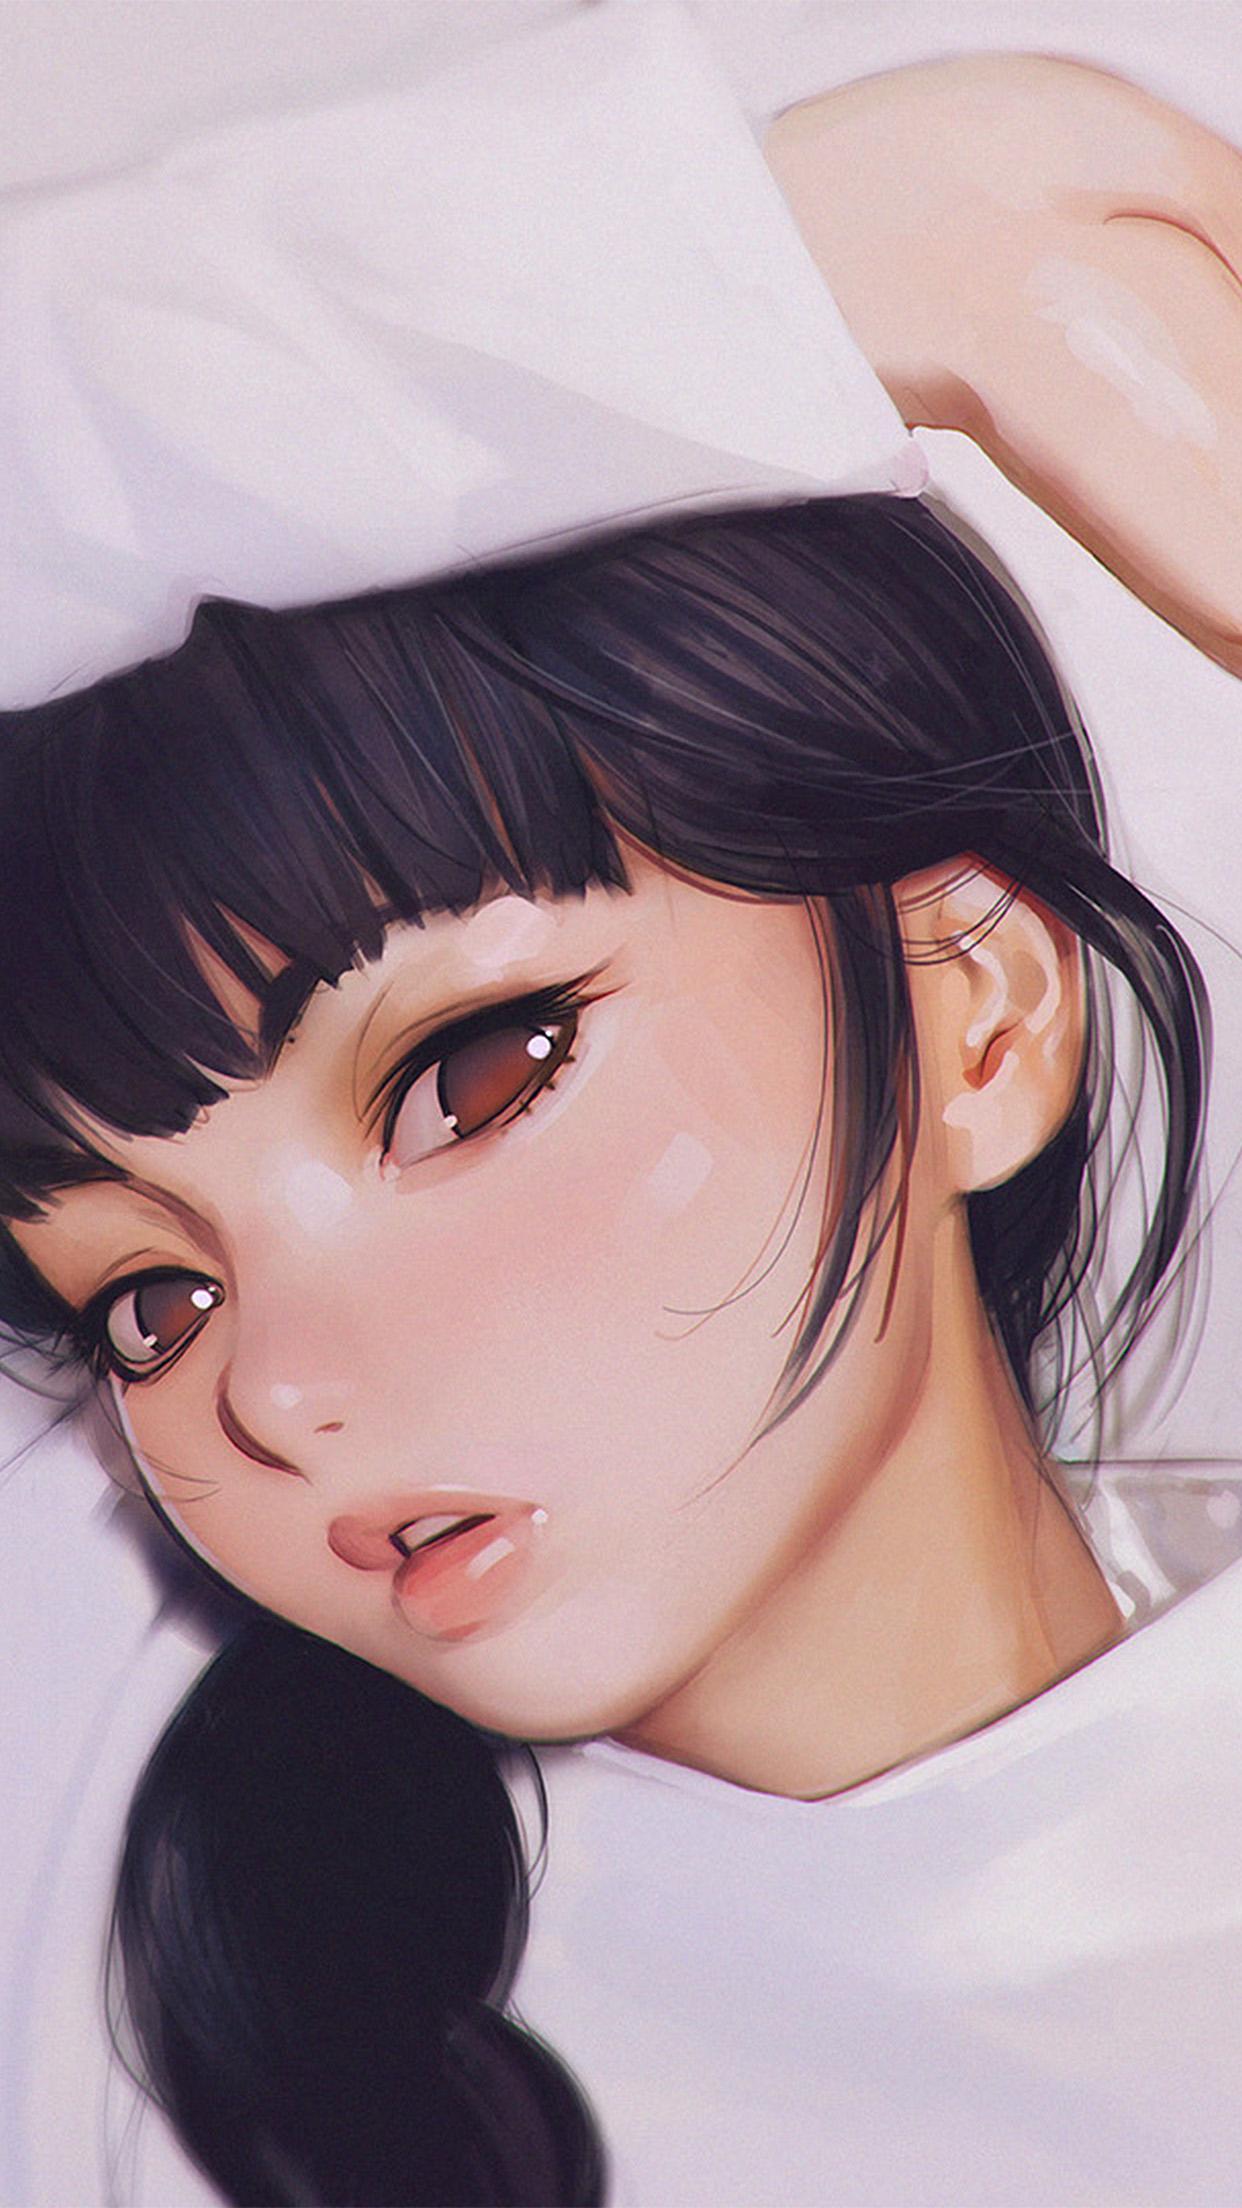 Download 440+ Wallpaper Anime Hd Portrait Android HD Paling Keren